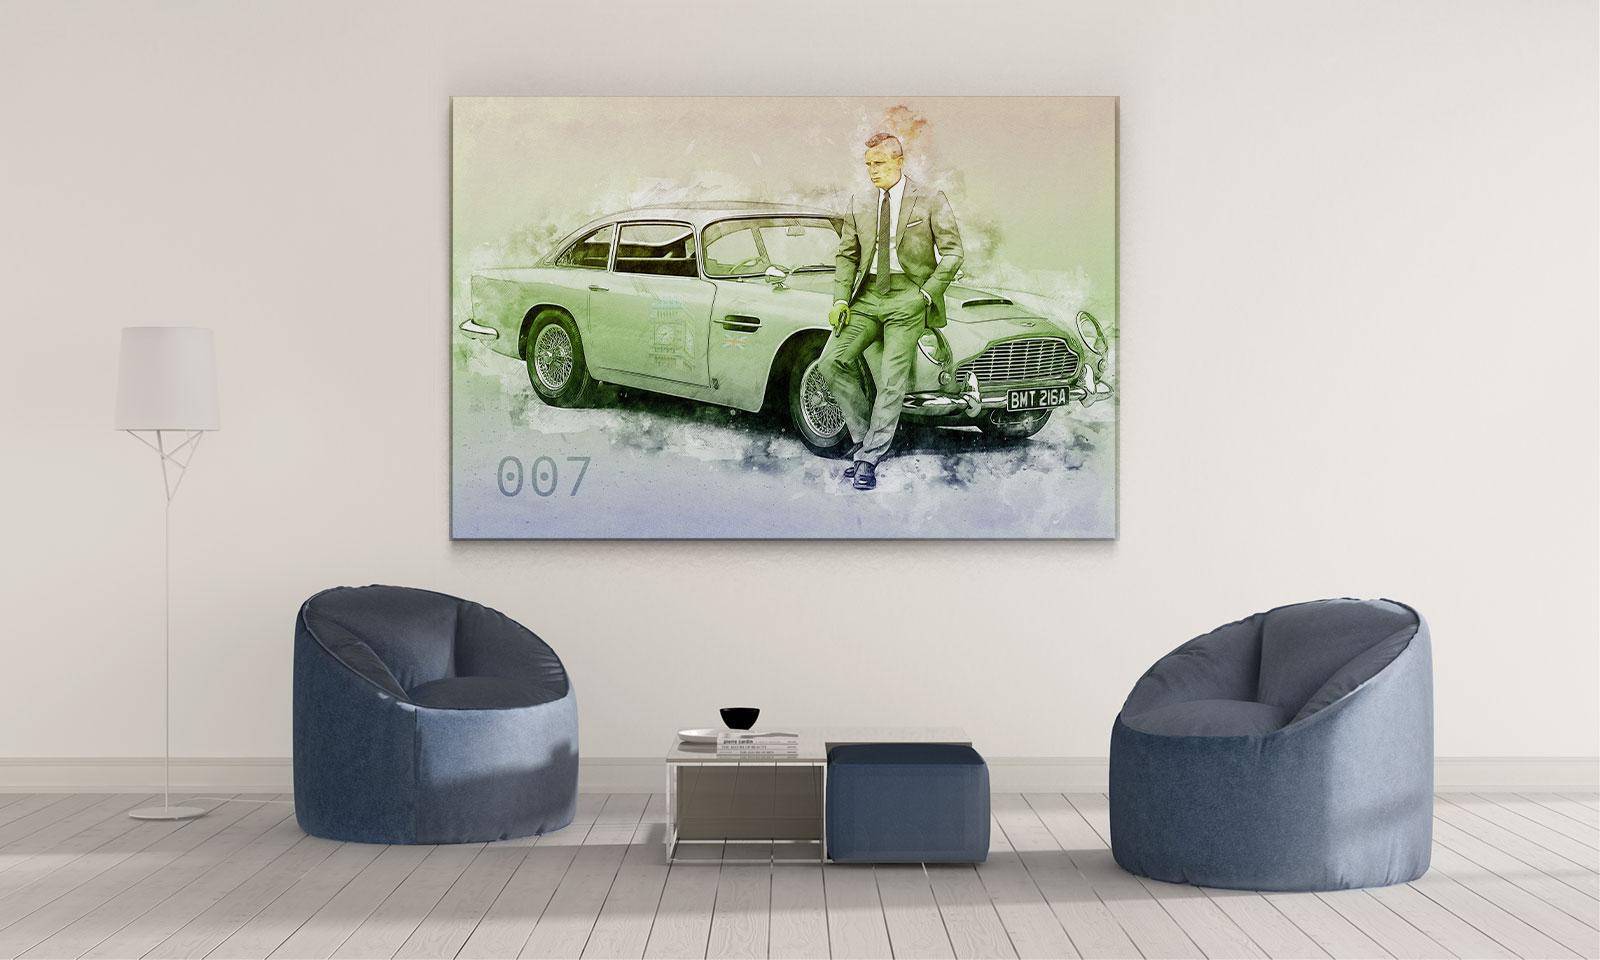 LED Bild Bond 007